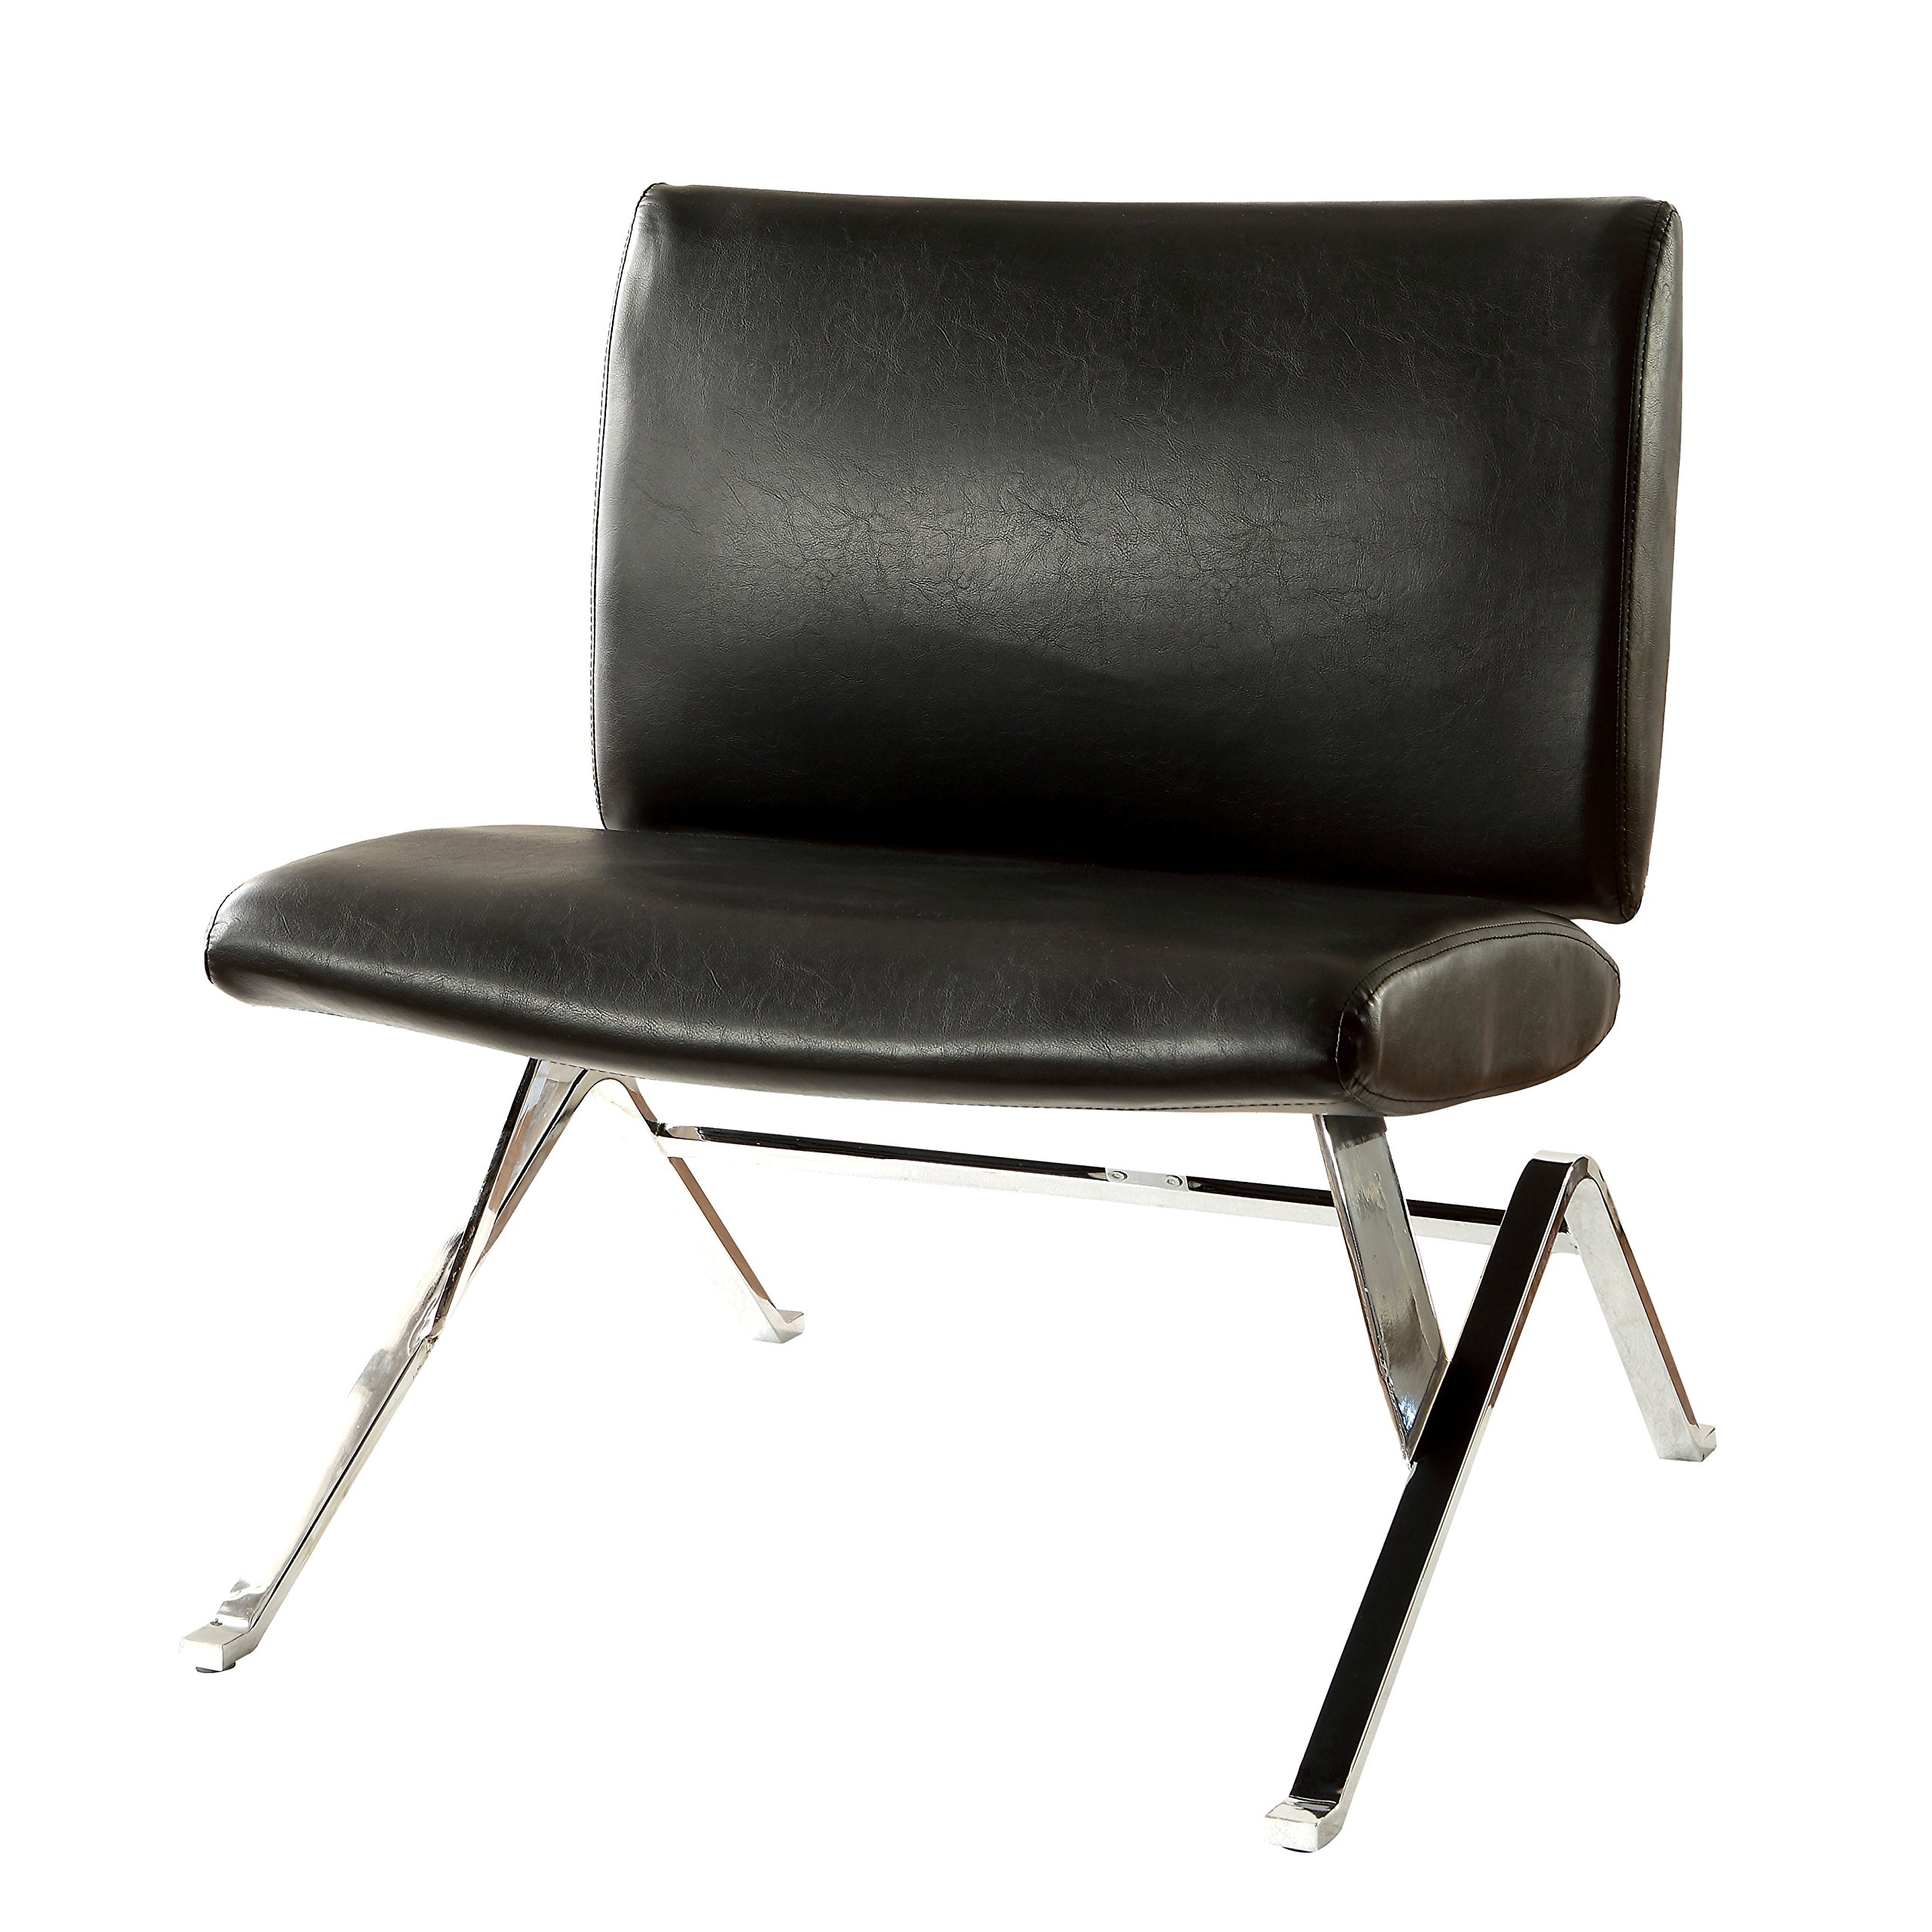 HOMES: Inside + Out IDF-AC4073BK Trelan Contemporary Living Room Chair, Black